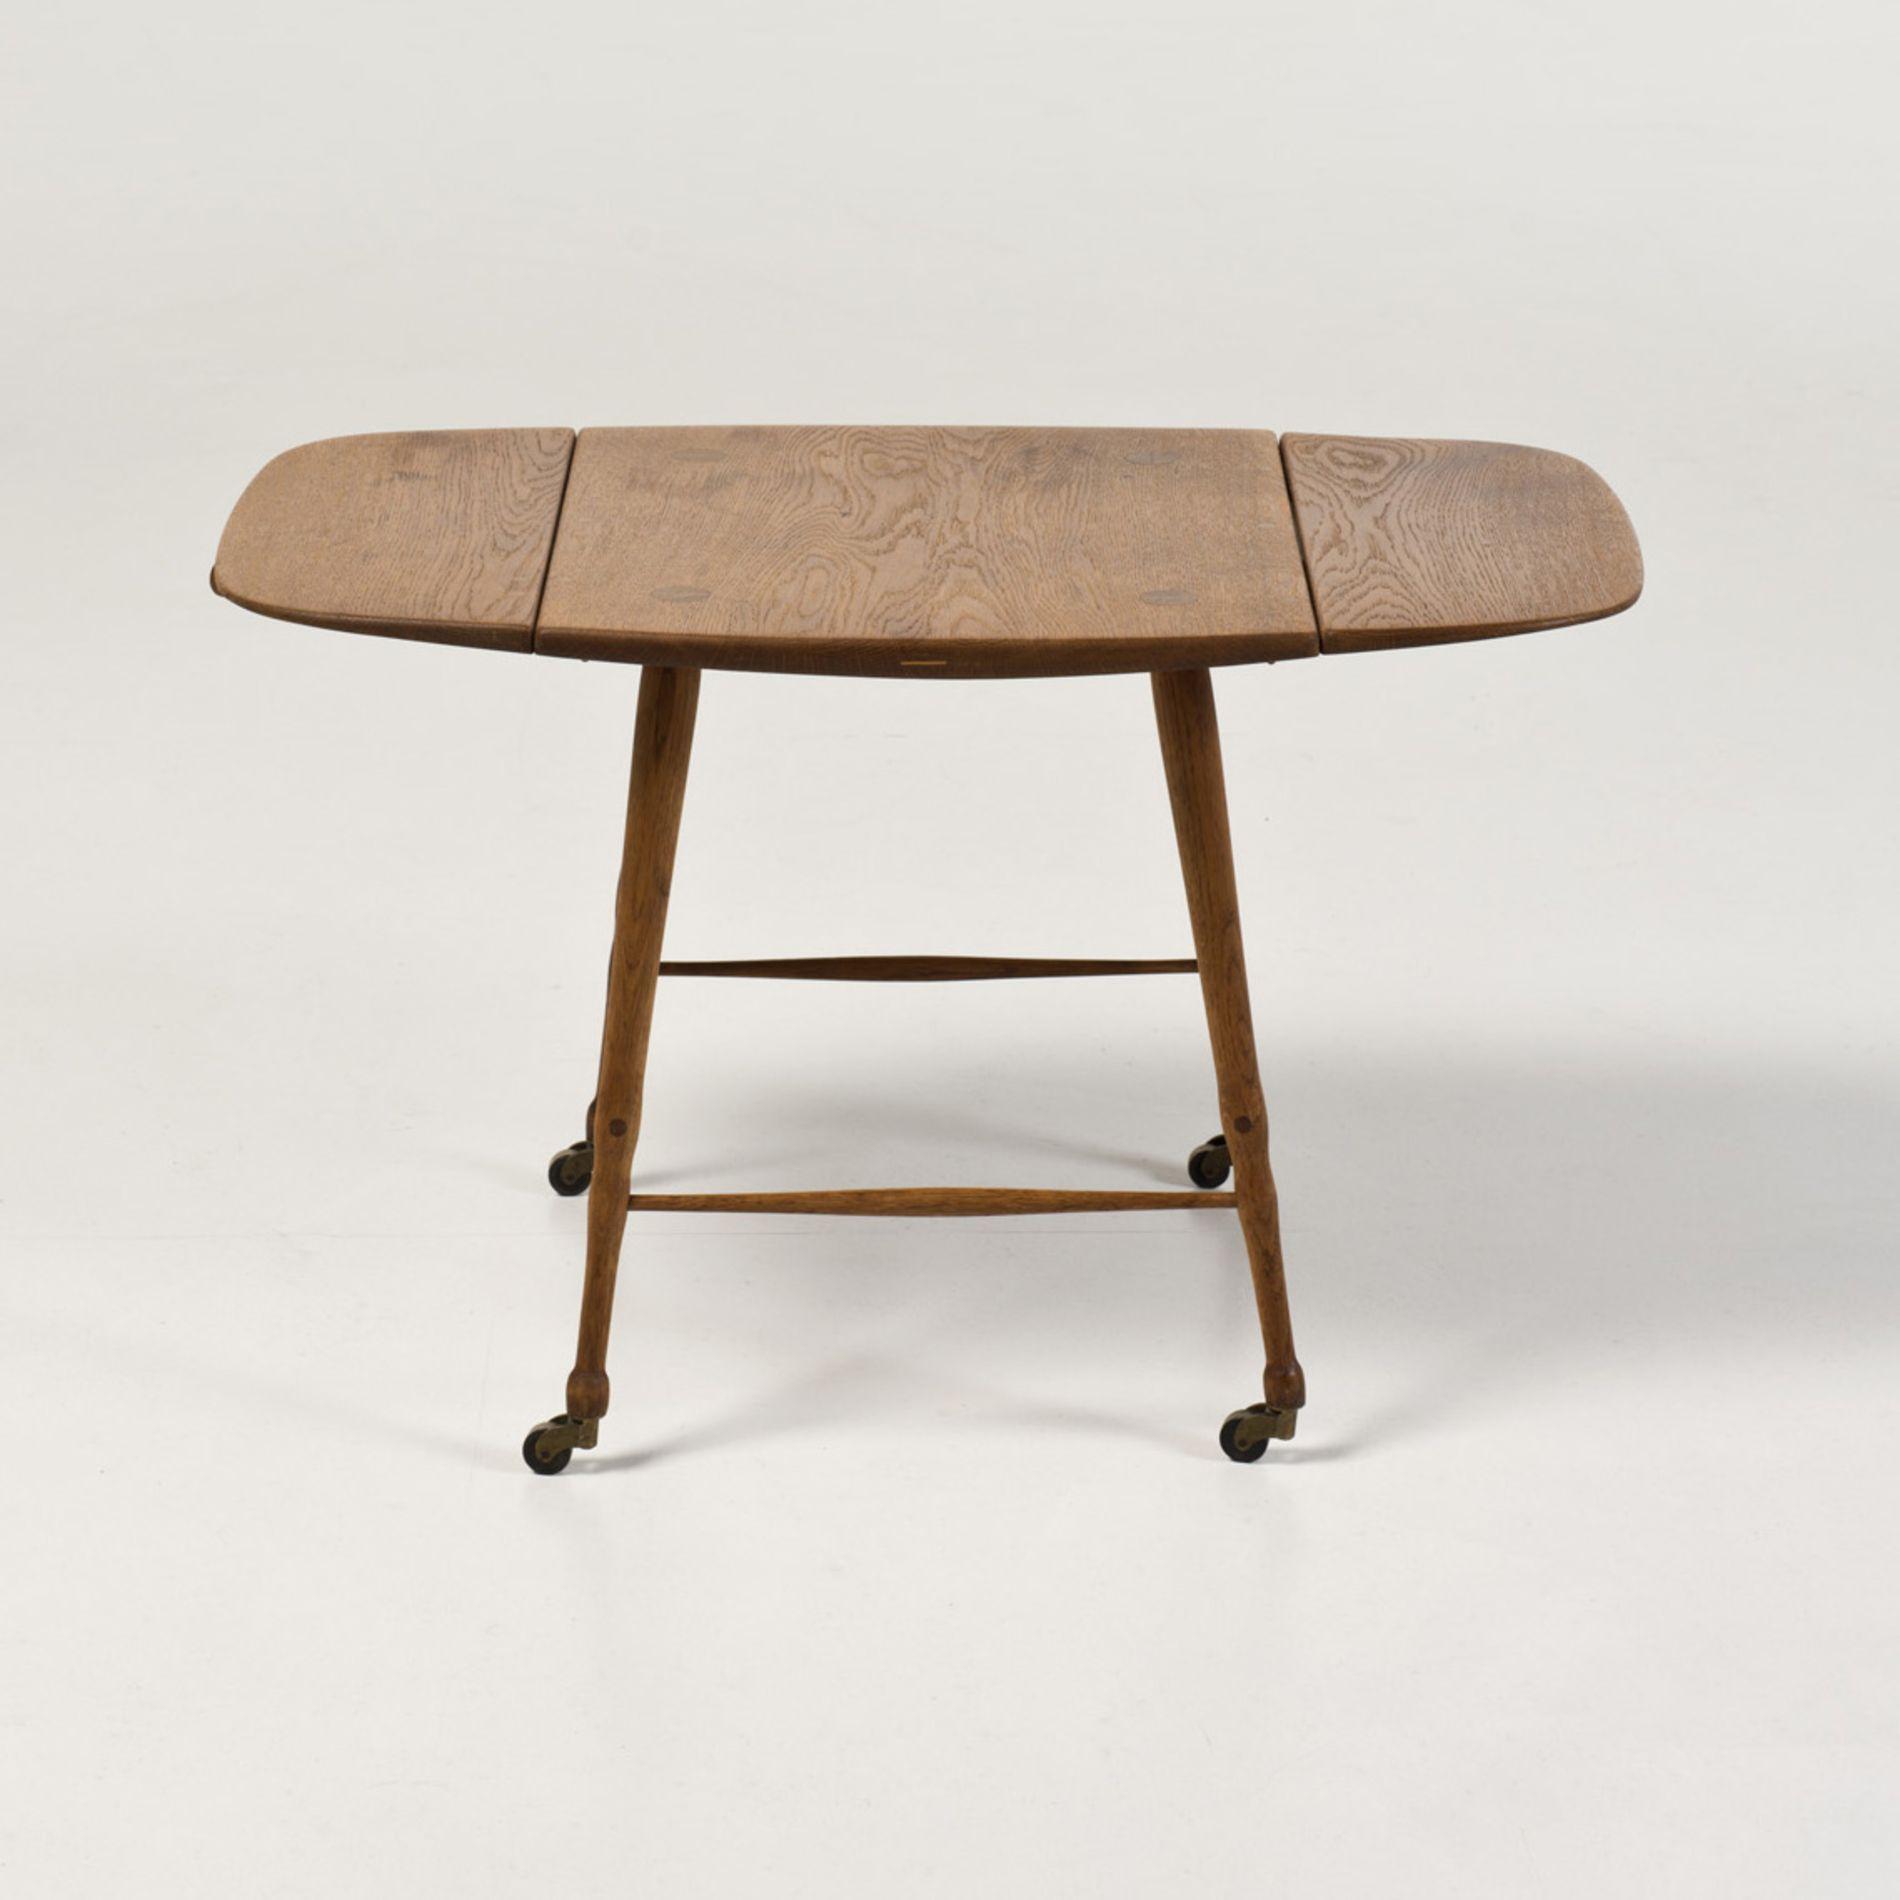 Peder Moos; Oak Table on Casters, 1947.